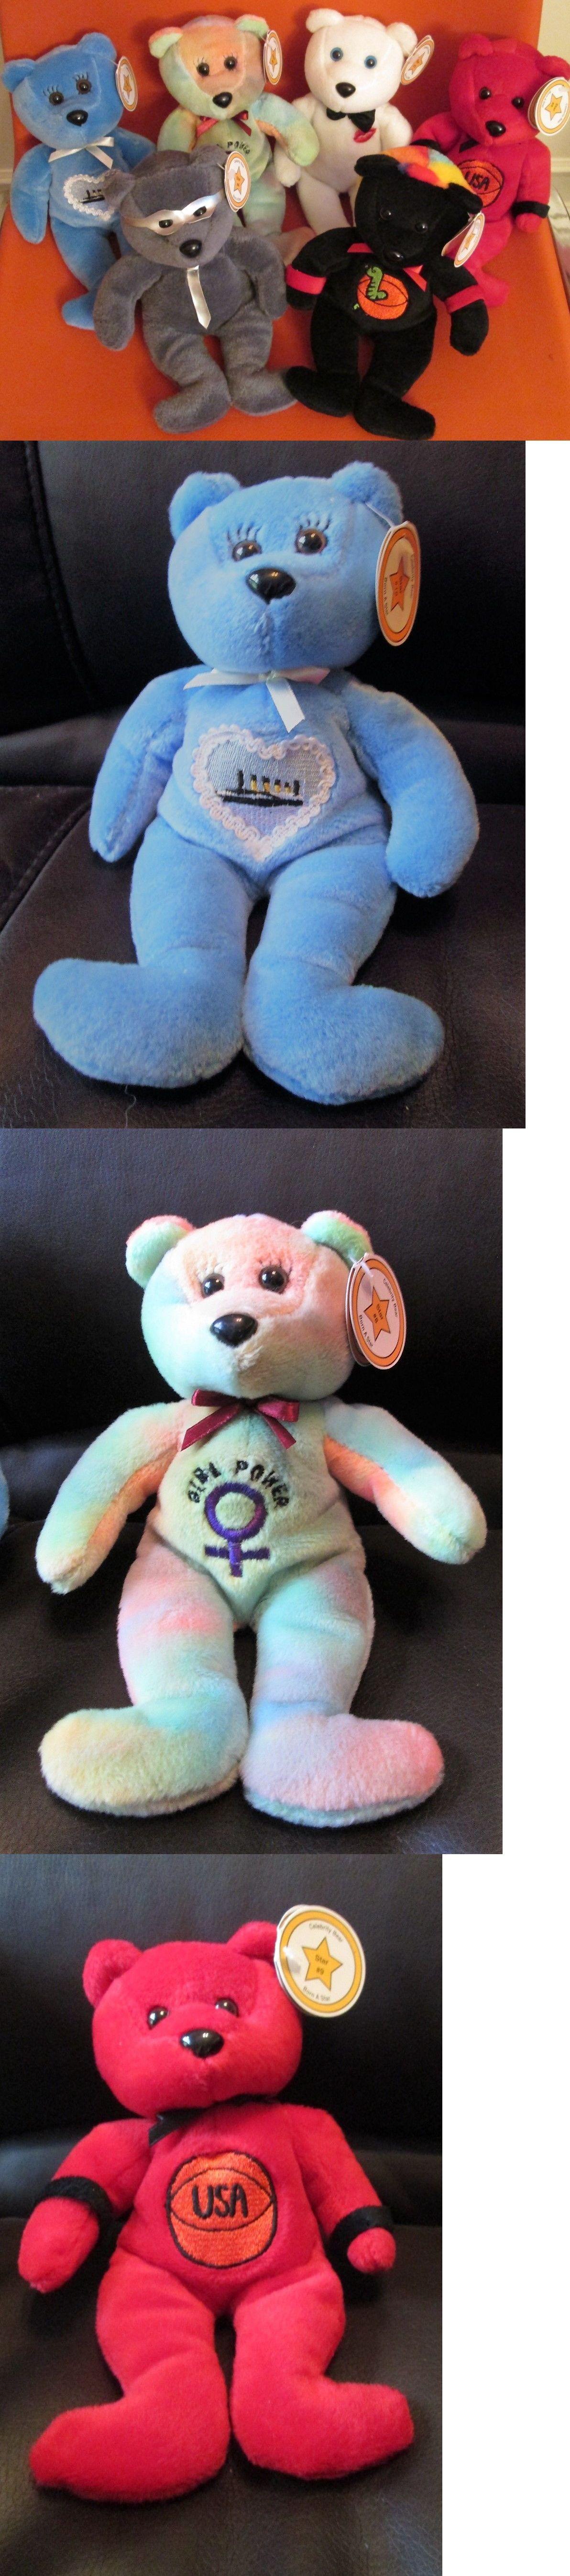 Celebrity Bears 49021 Lot Of 6 Celebrity Beanie Baby